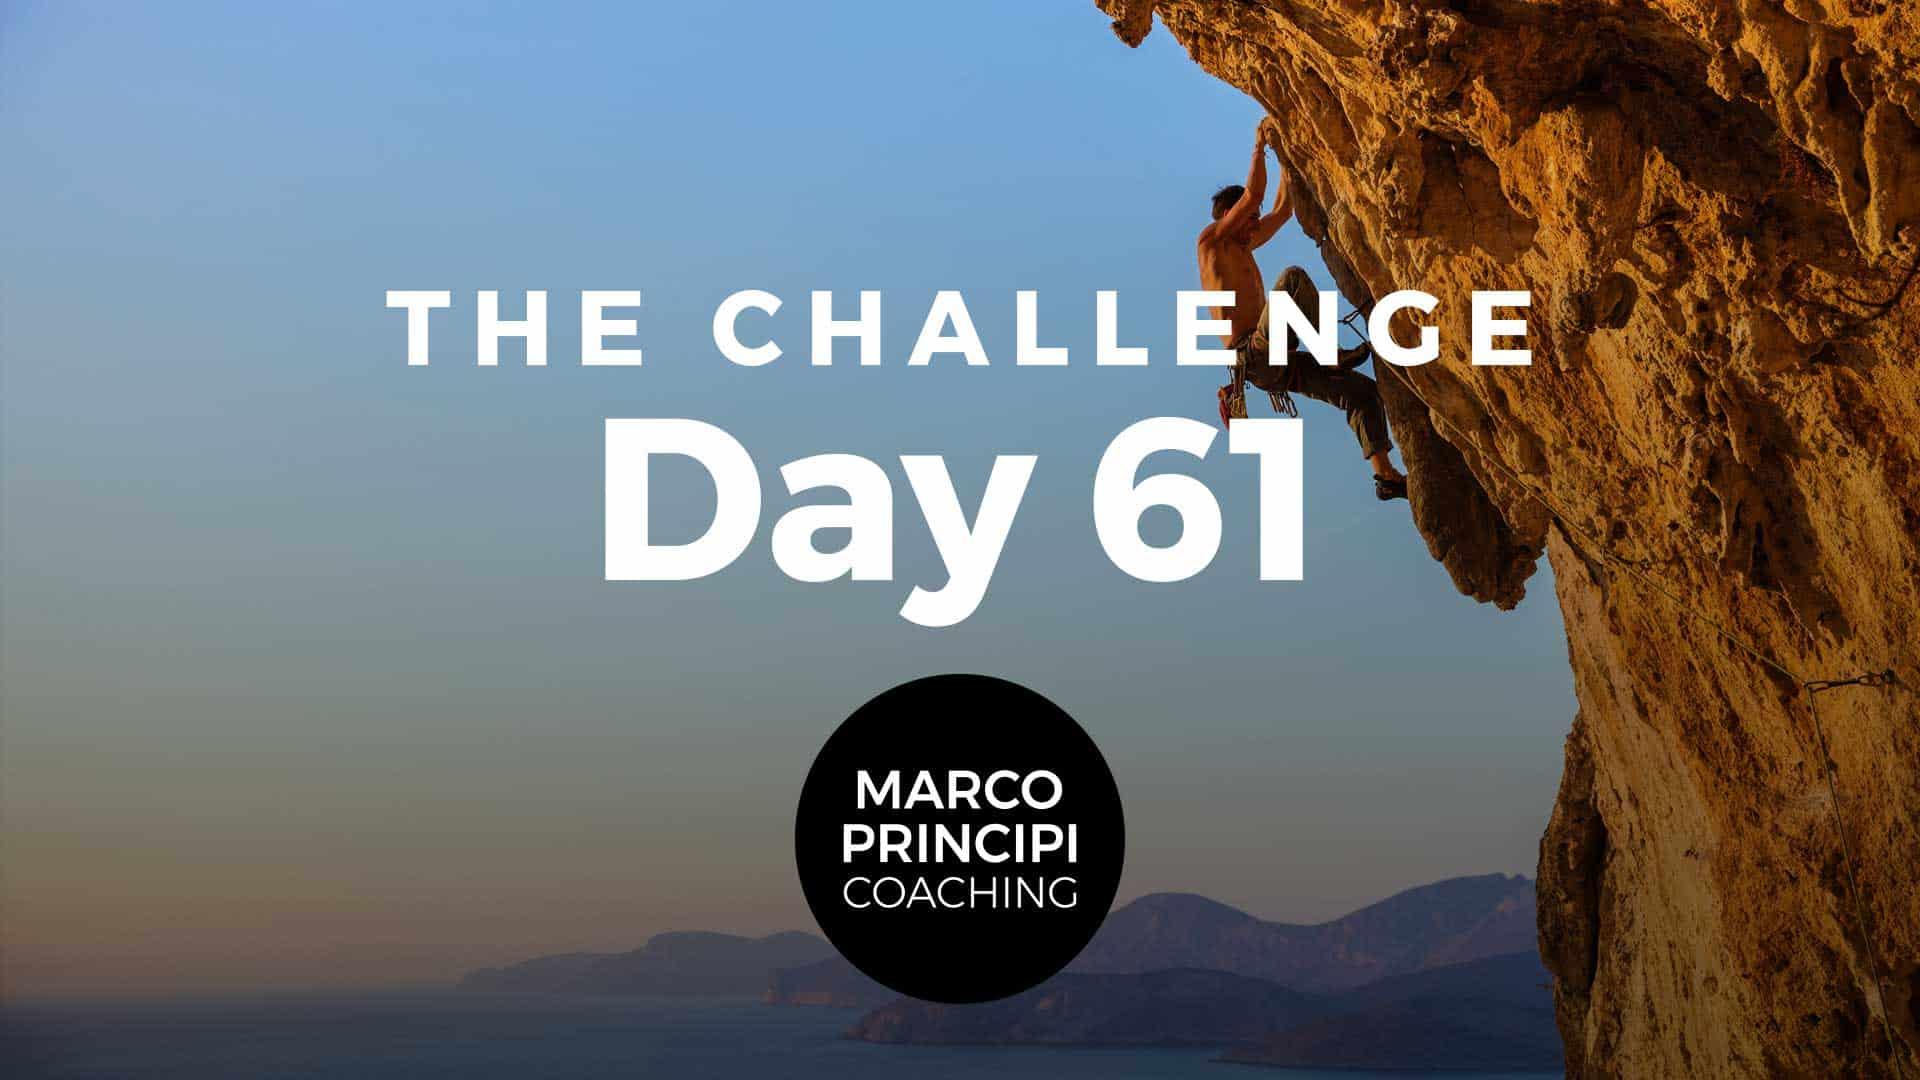 Marco Principi The Challenge Day 61